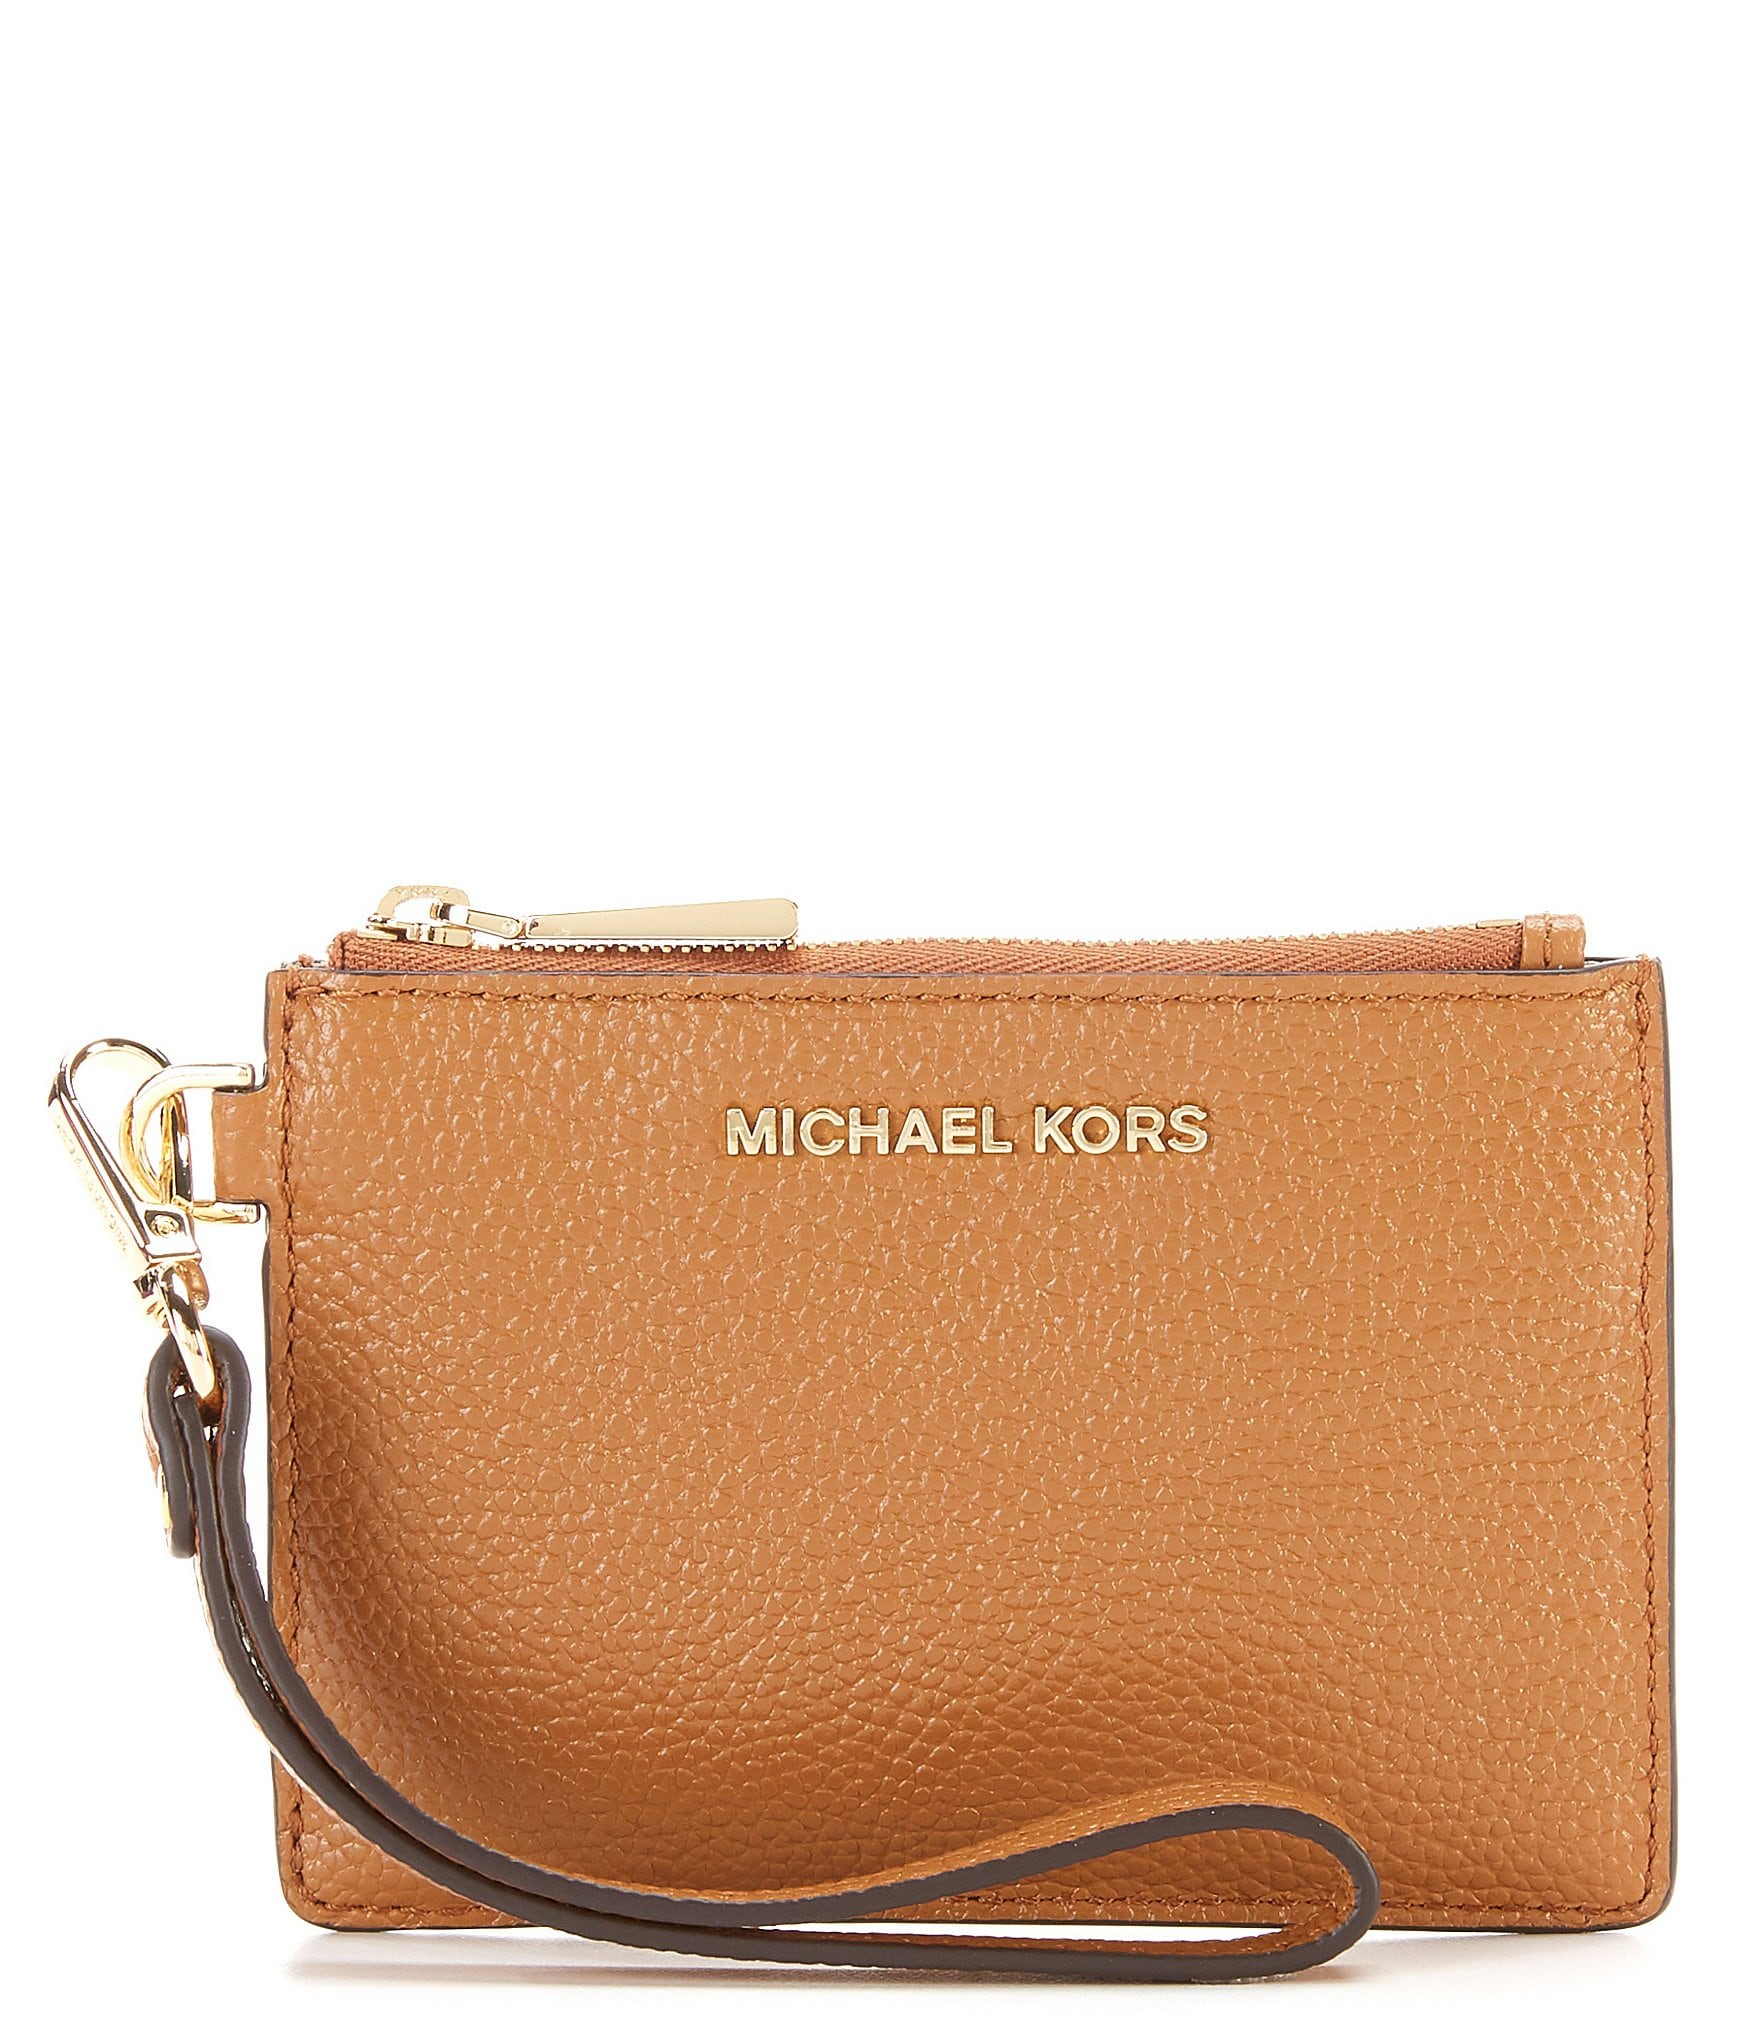 7c9307d7555cf5 Handbags | Wristlets, Keychains, & Cases | Coin Purses | Dillard's